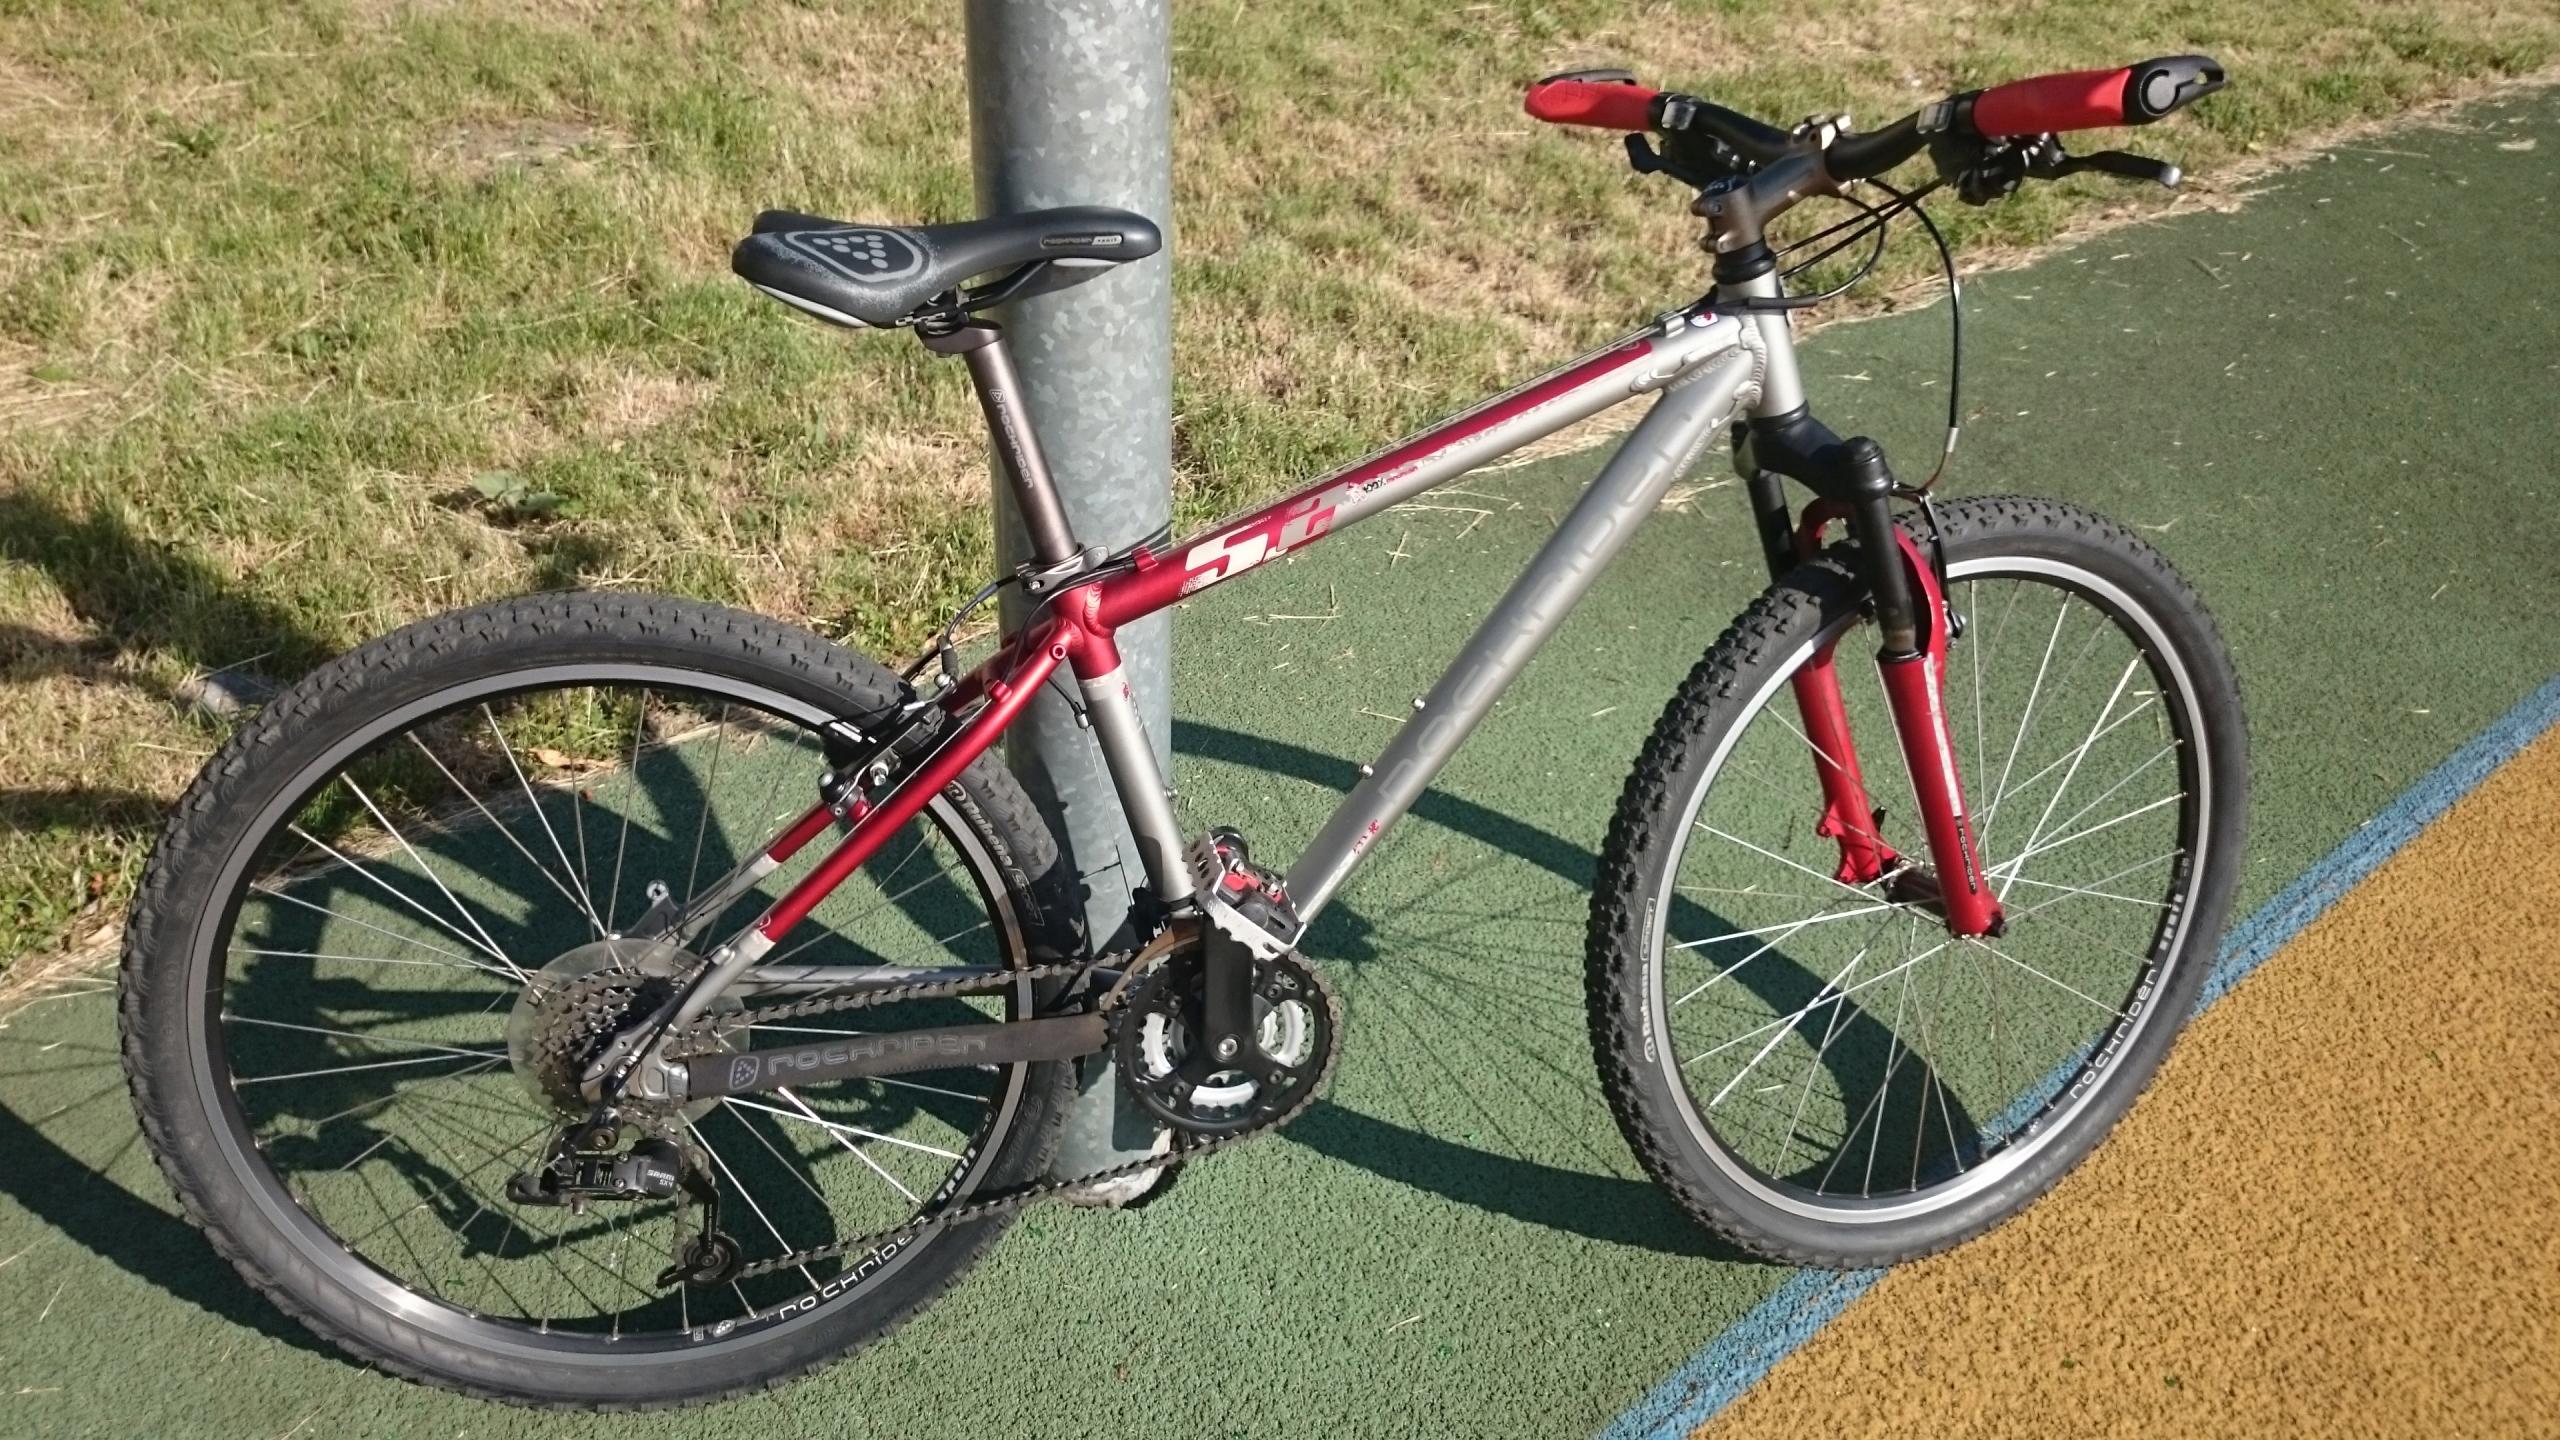 rower ROCKRIDER 5.2 koła26 S (GIANT MERIDA KROSS )